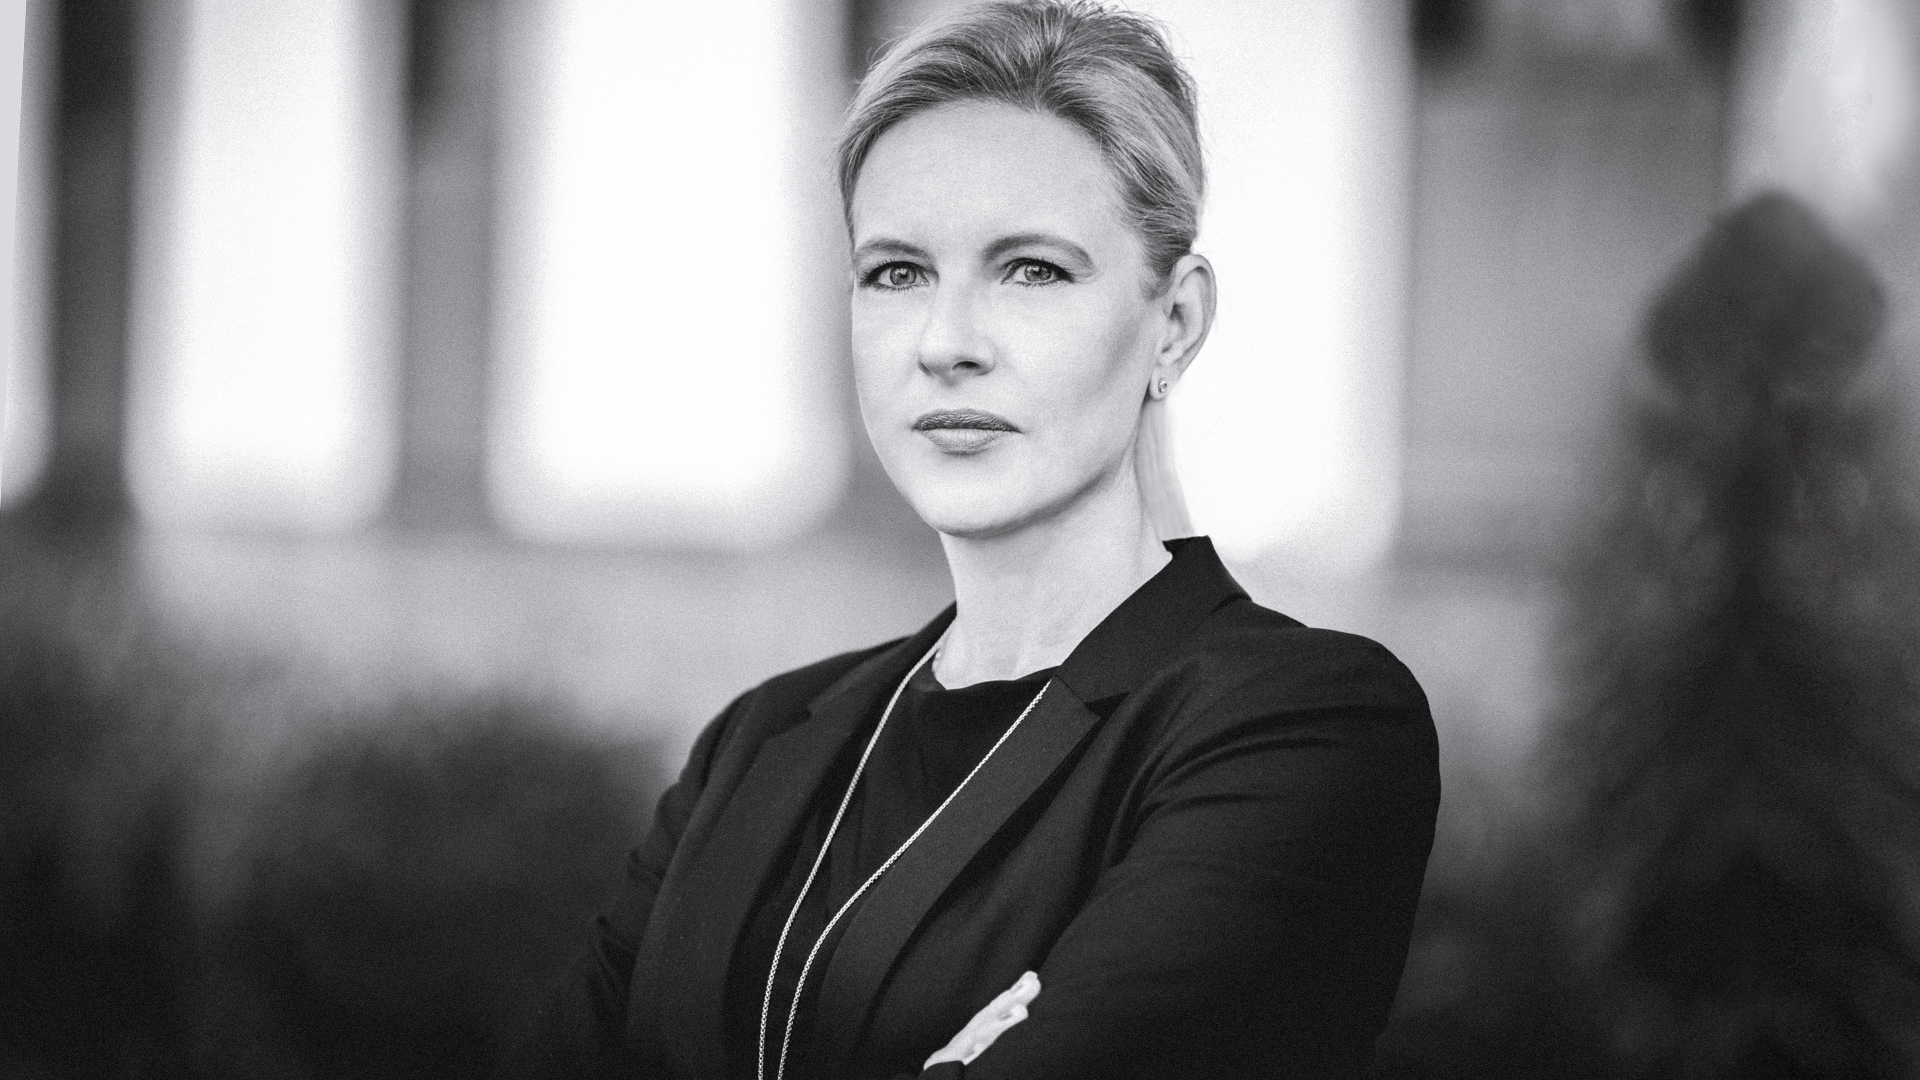 Anja M. Gall-Colbatz Anwaltskanzlei Weiden Rechtsanwältin